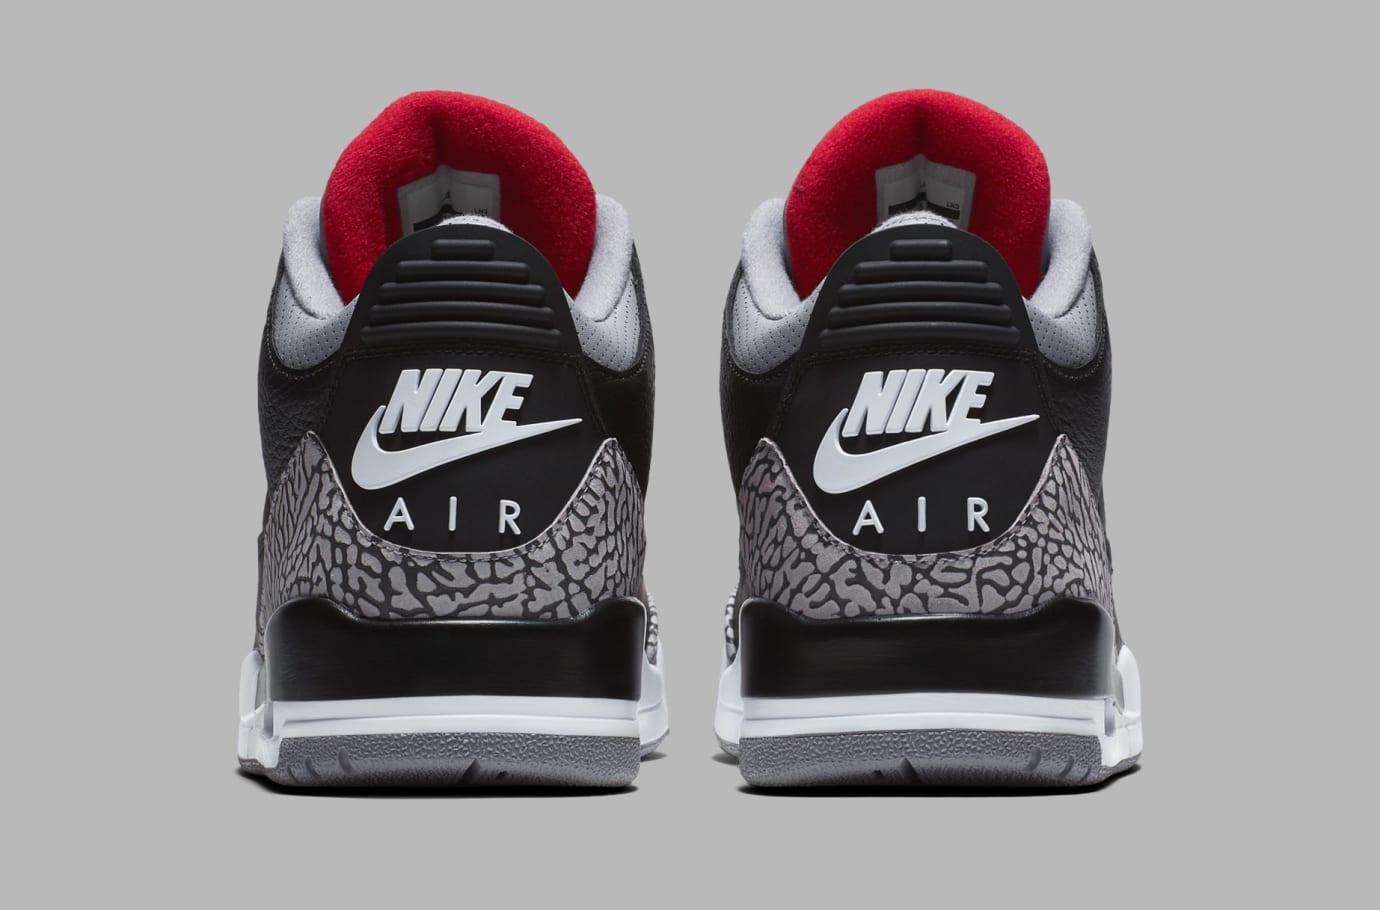 Air Jordan 3 Black/Cement Grey-White-Fire Red 854262-001 (Heel)